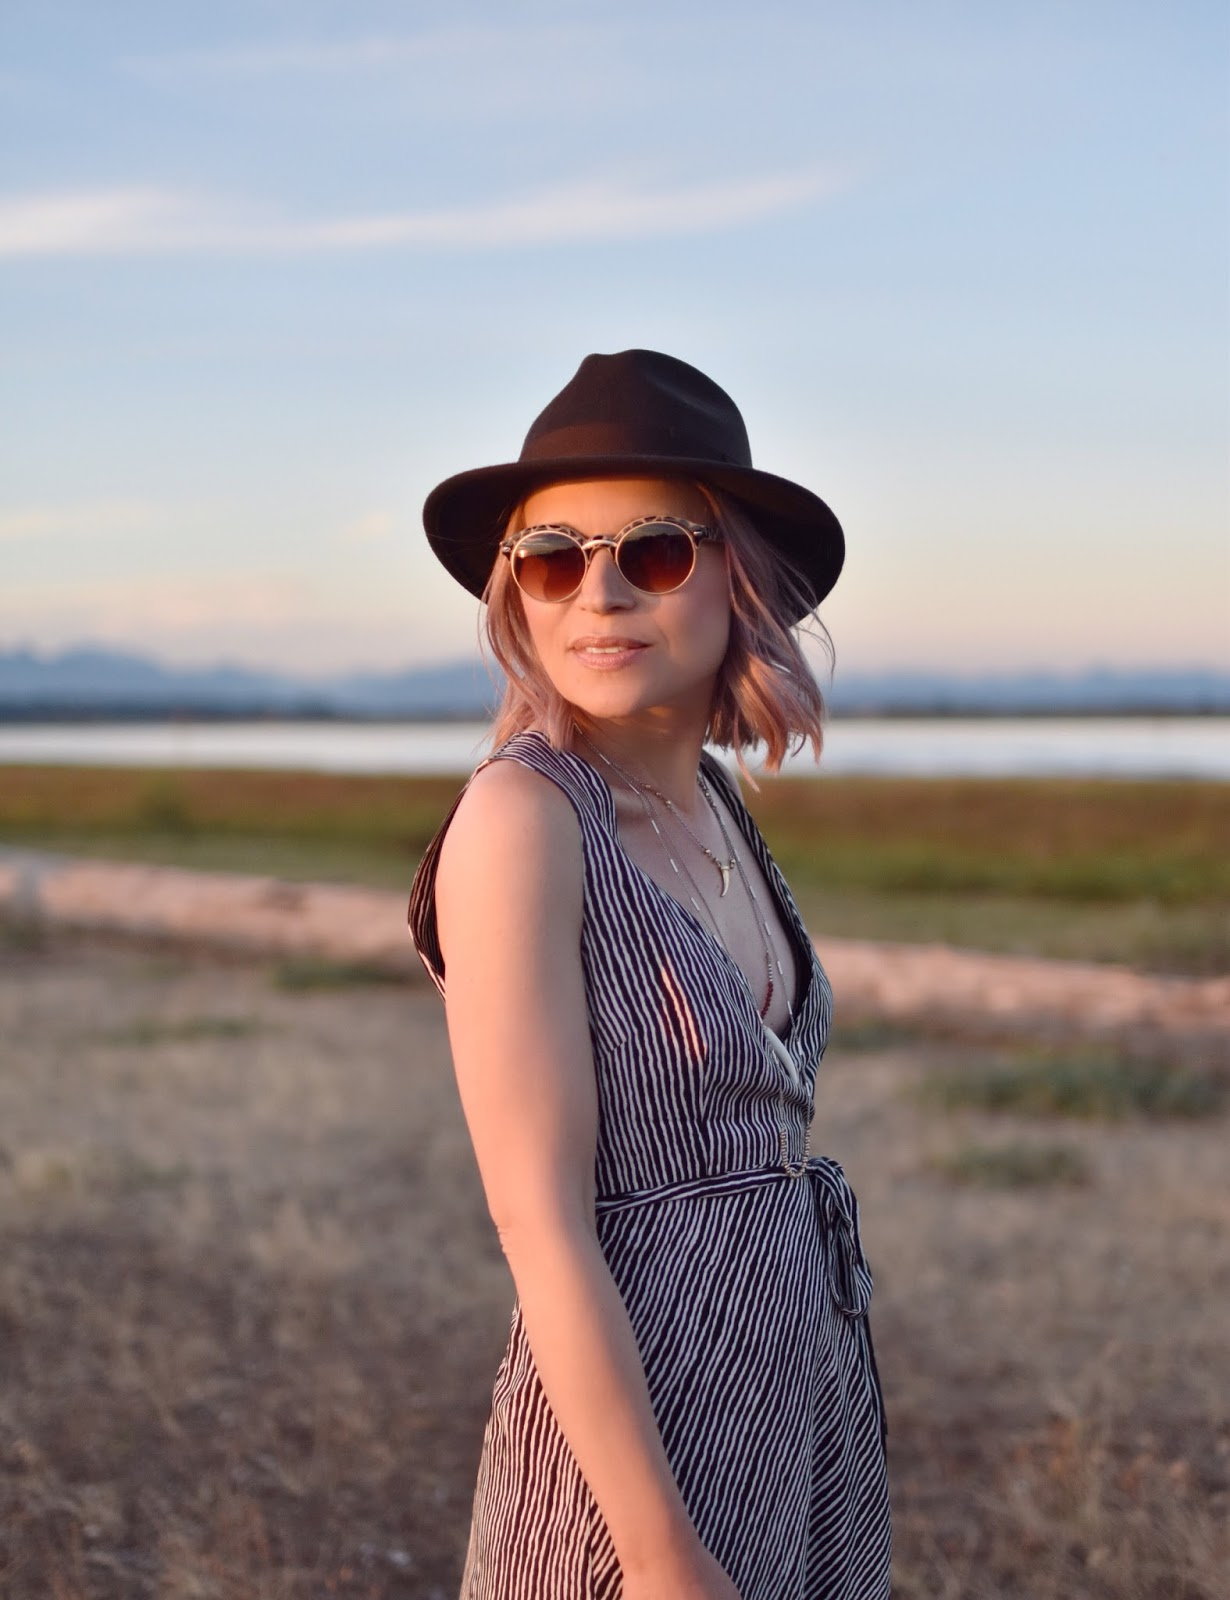 Monika Faulkner personal style inspiration - black and white striped maxi-dress, brown felt fedora, animal-patterned sunglasses